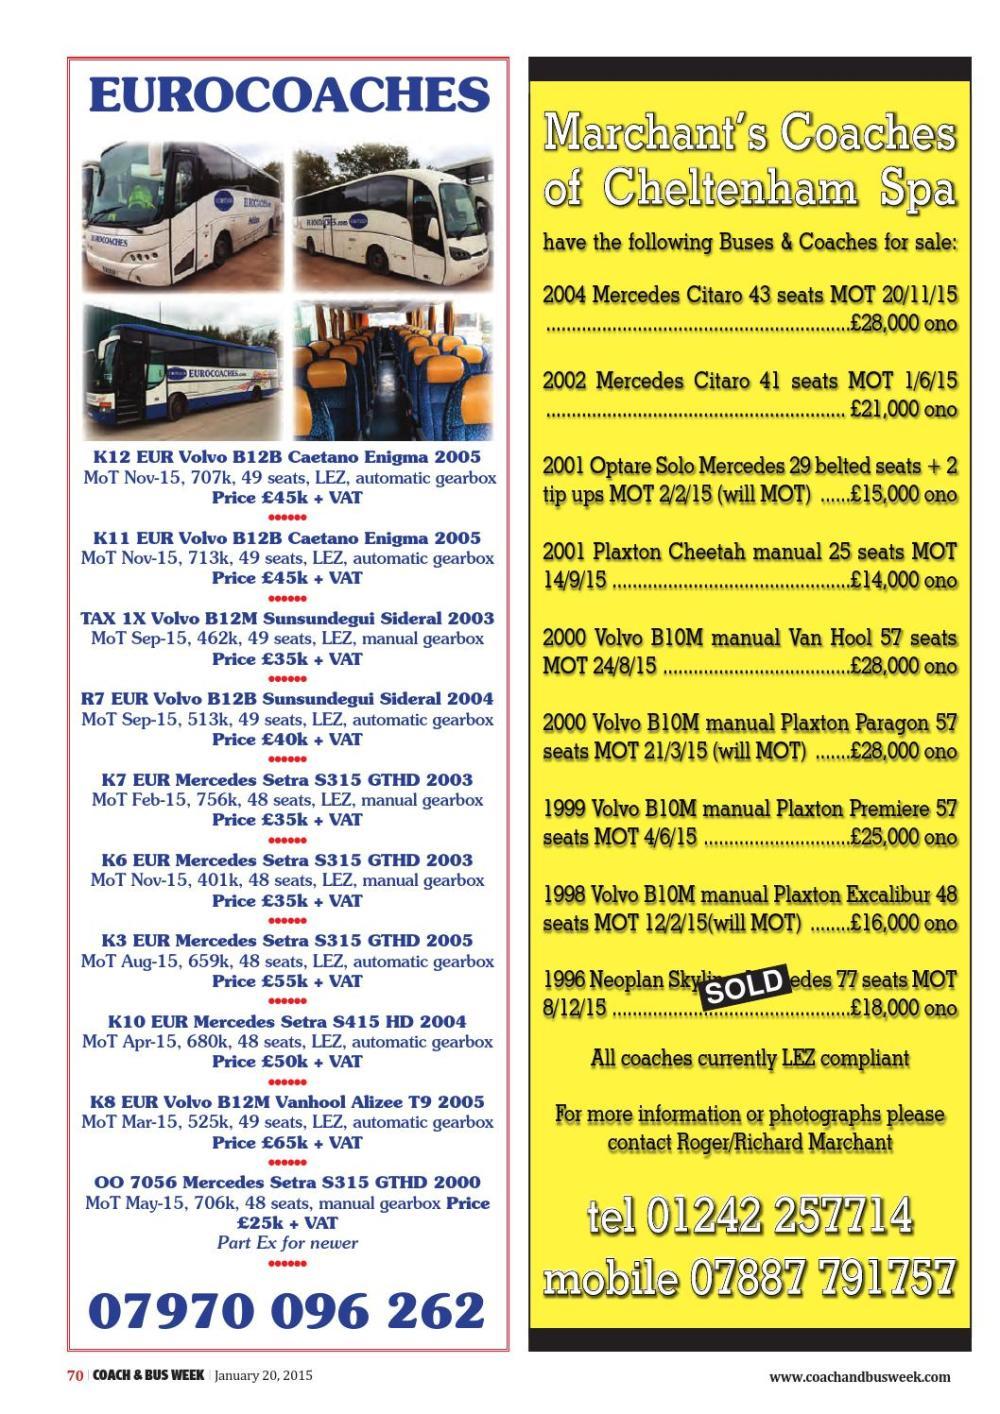 medium resolution of 1992 volvo b10m plaxton paramount manual 53 seats array coach u0026 bus week issue 1172 by coach and bus week u0026 group travel